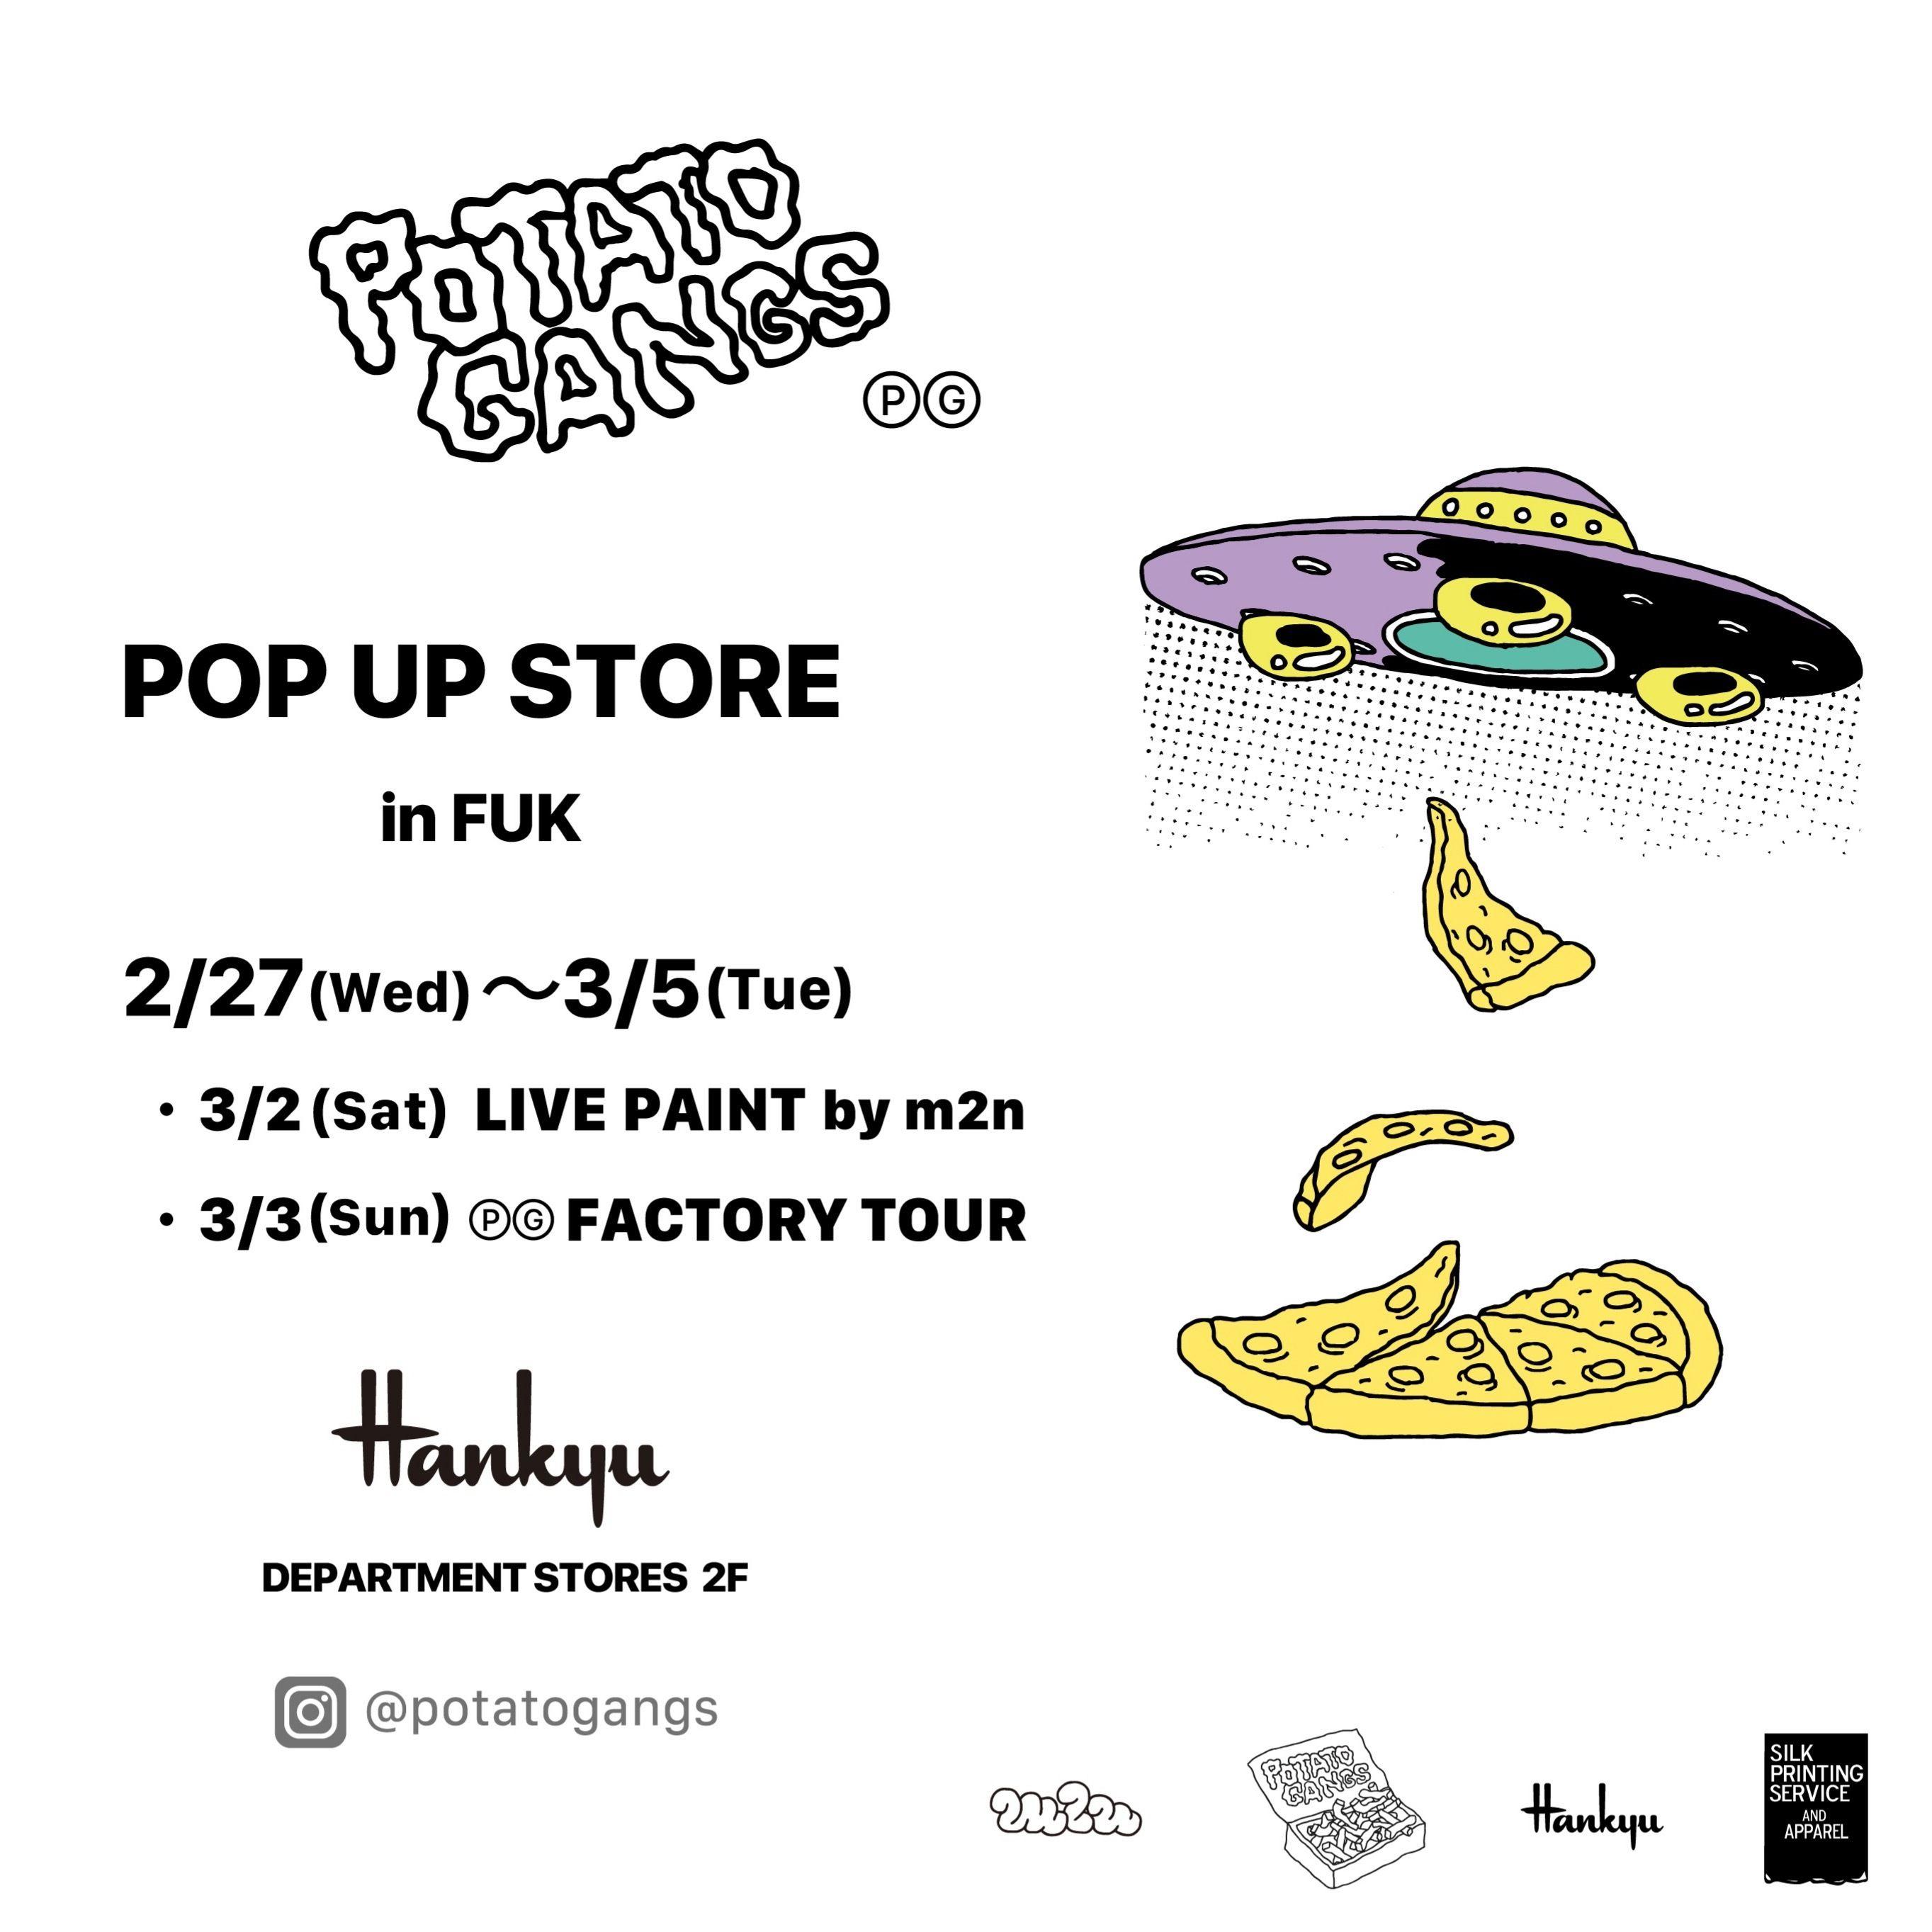 POP UP & EVENT